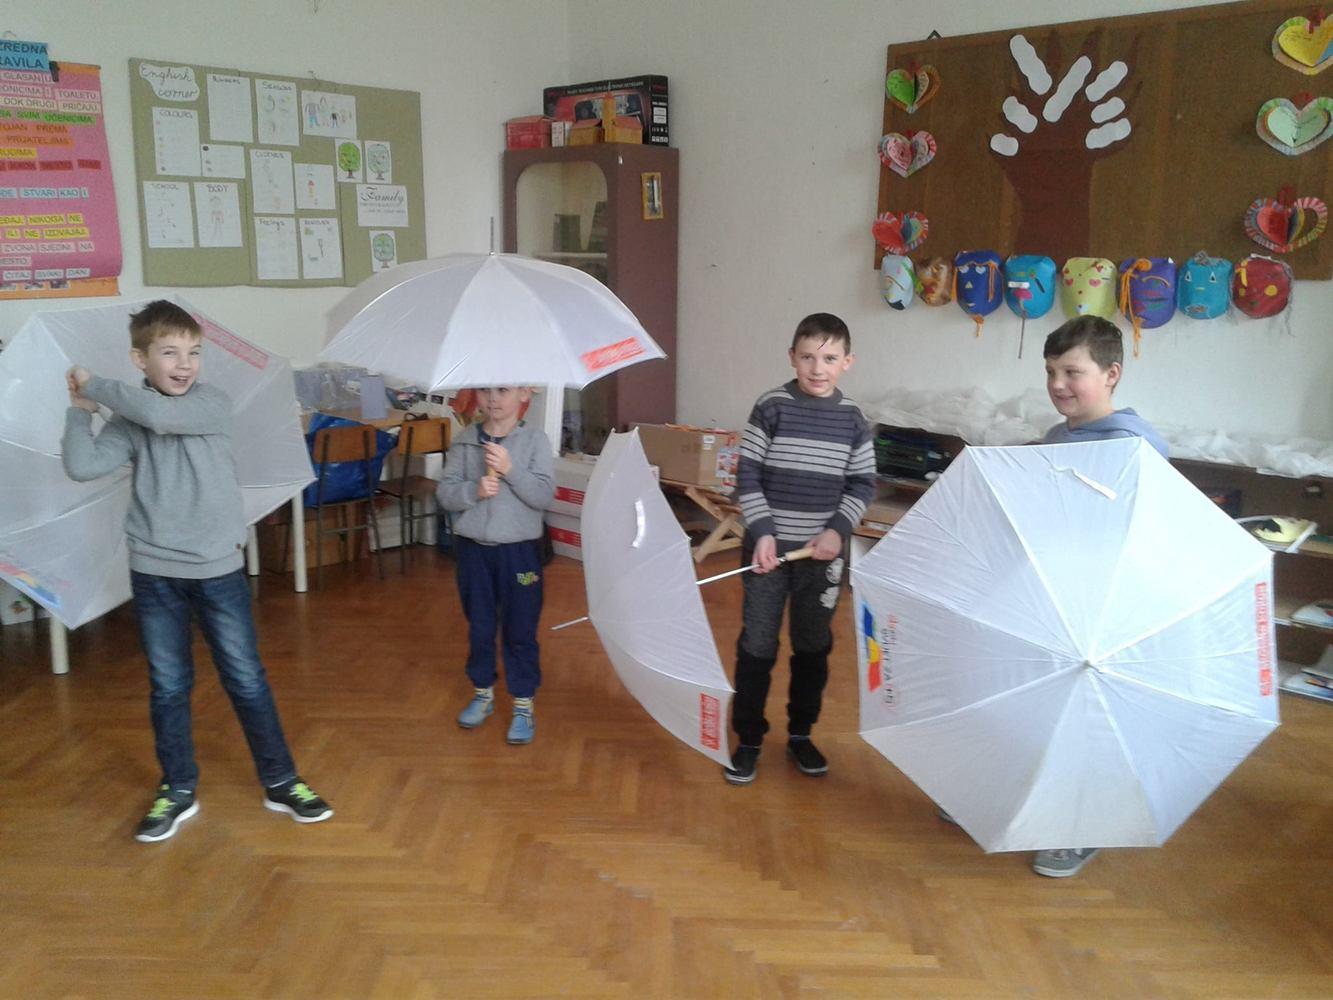 I. osnovna škola Bjelovar, PŠ Tomaš